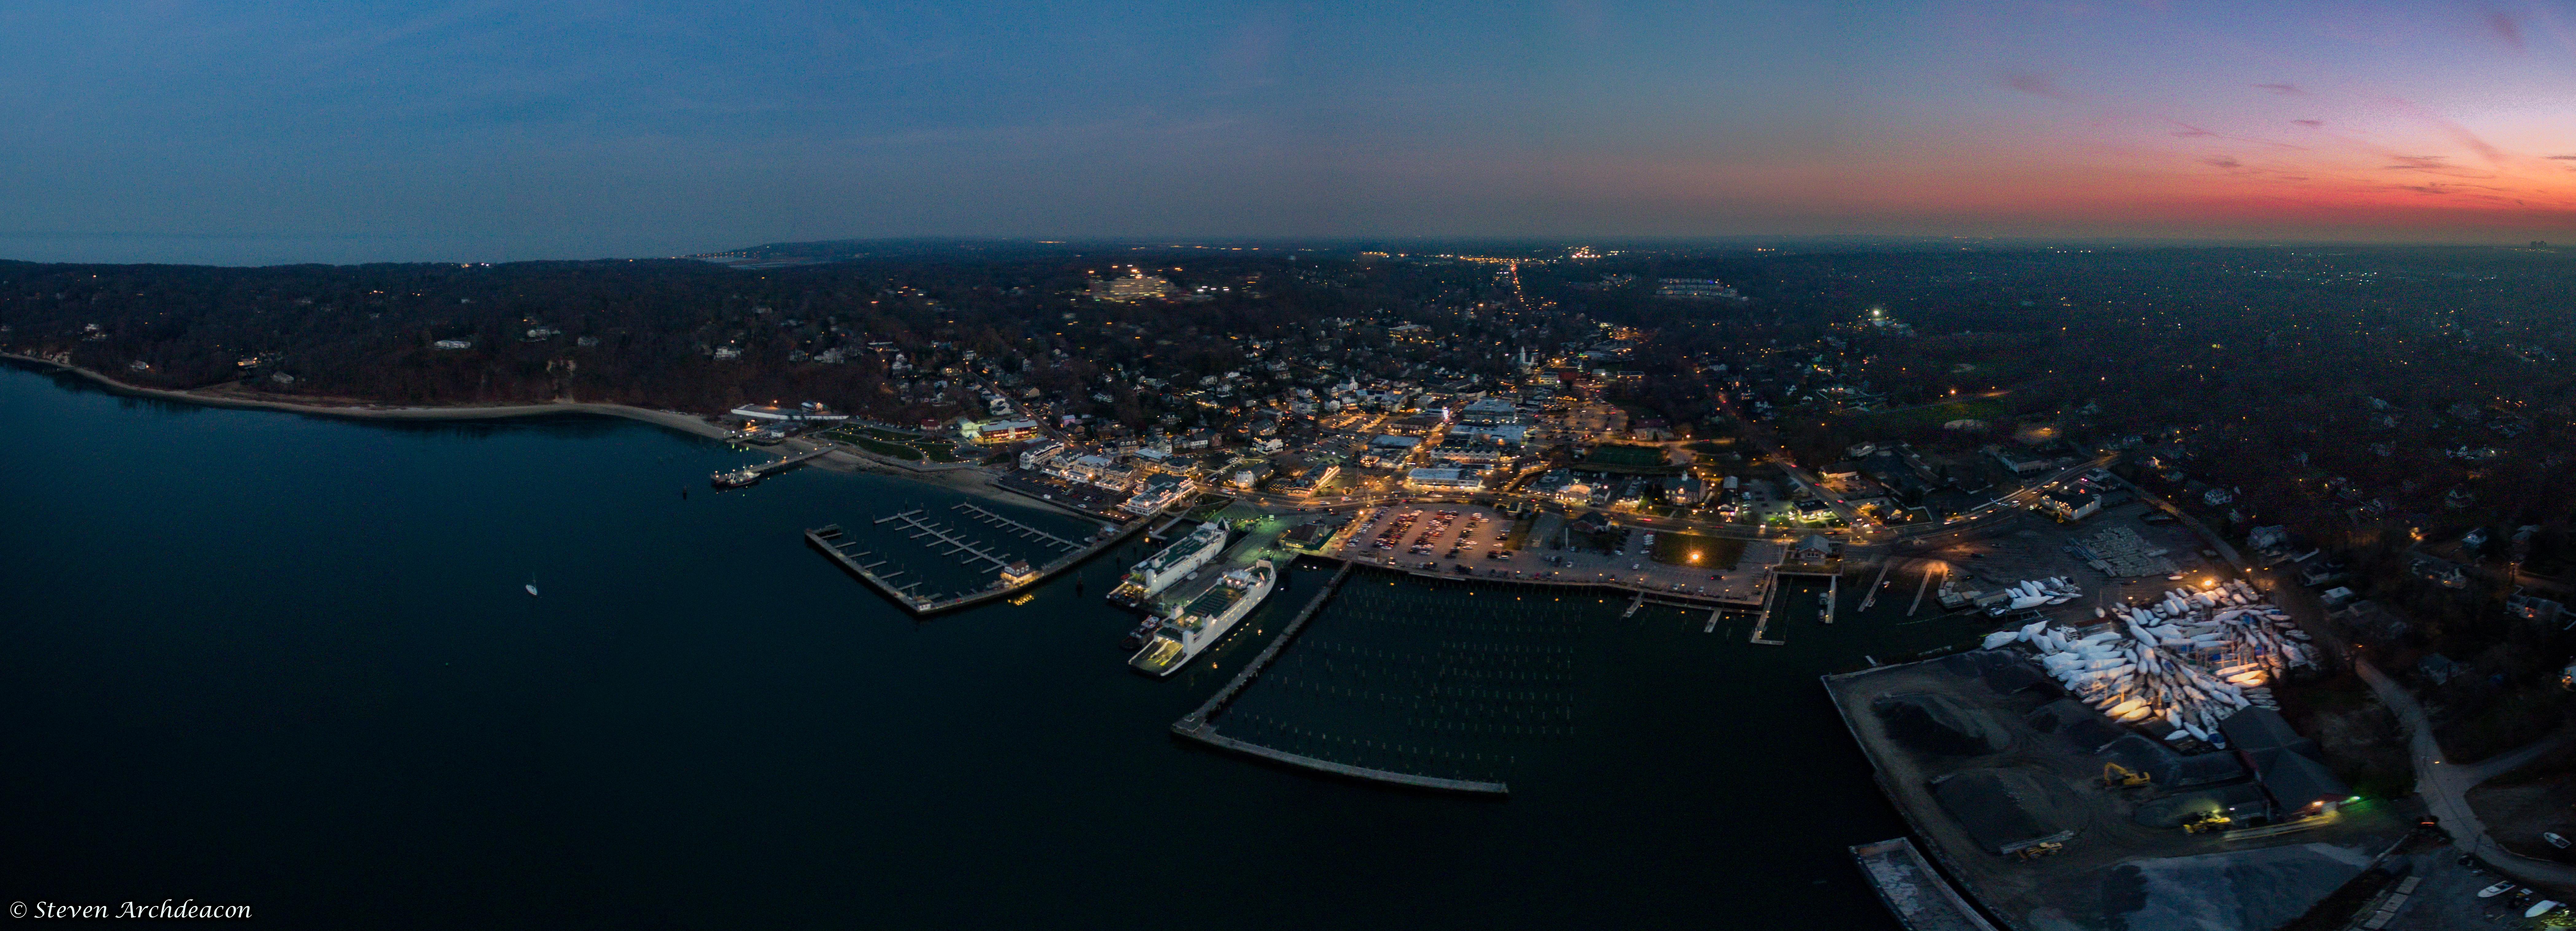 PJ Harbor Aerial Pano